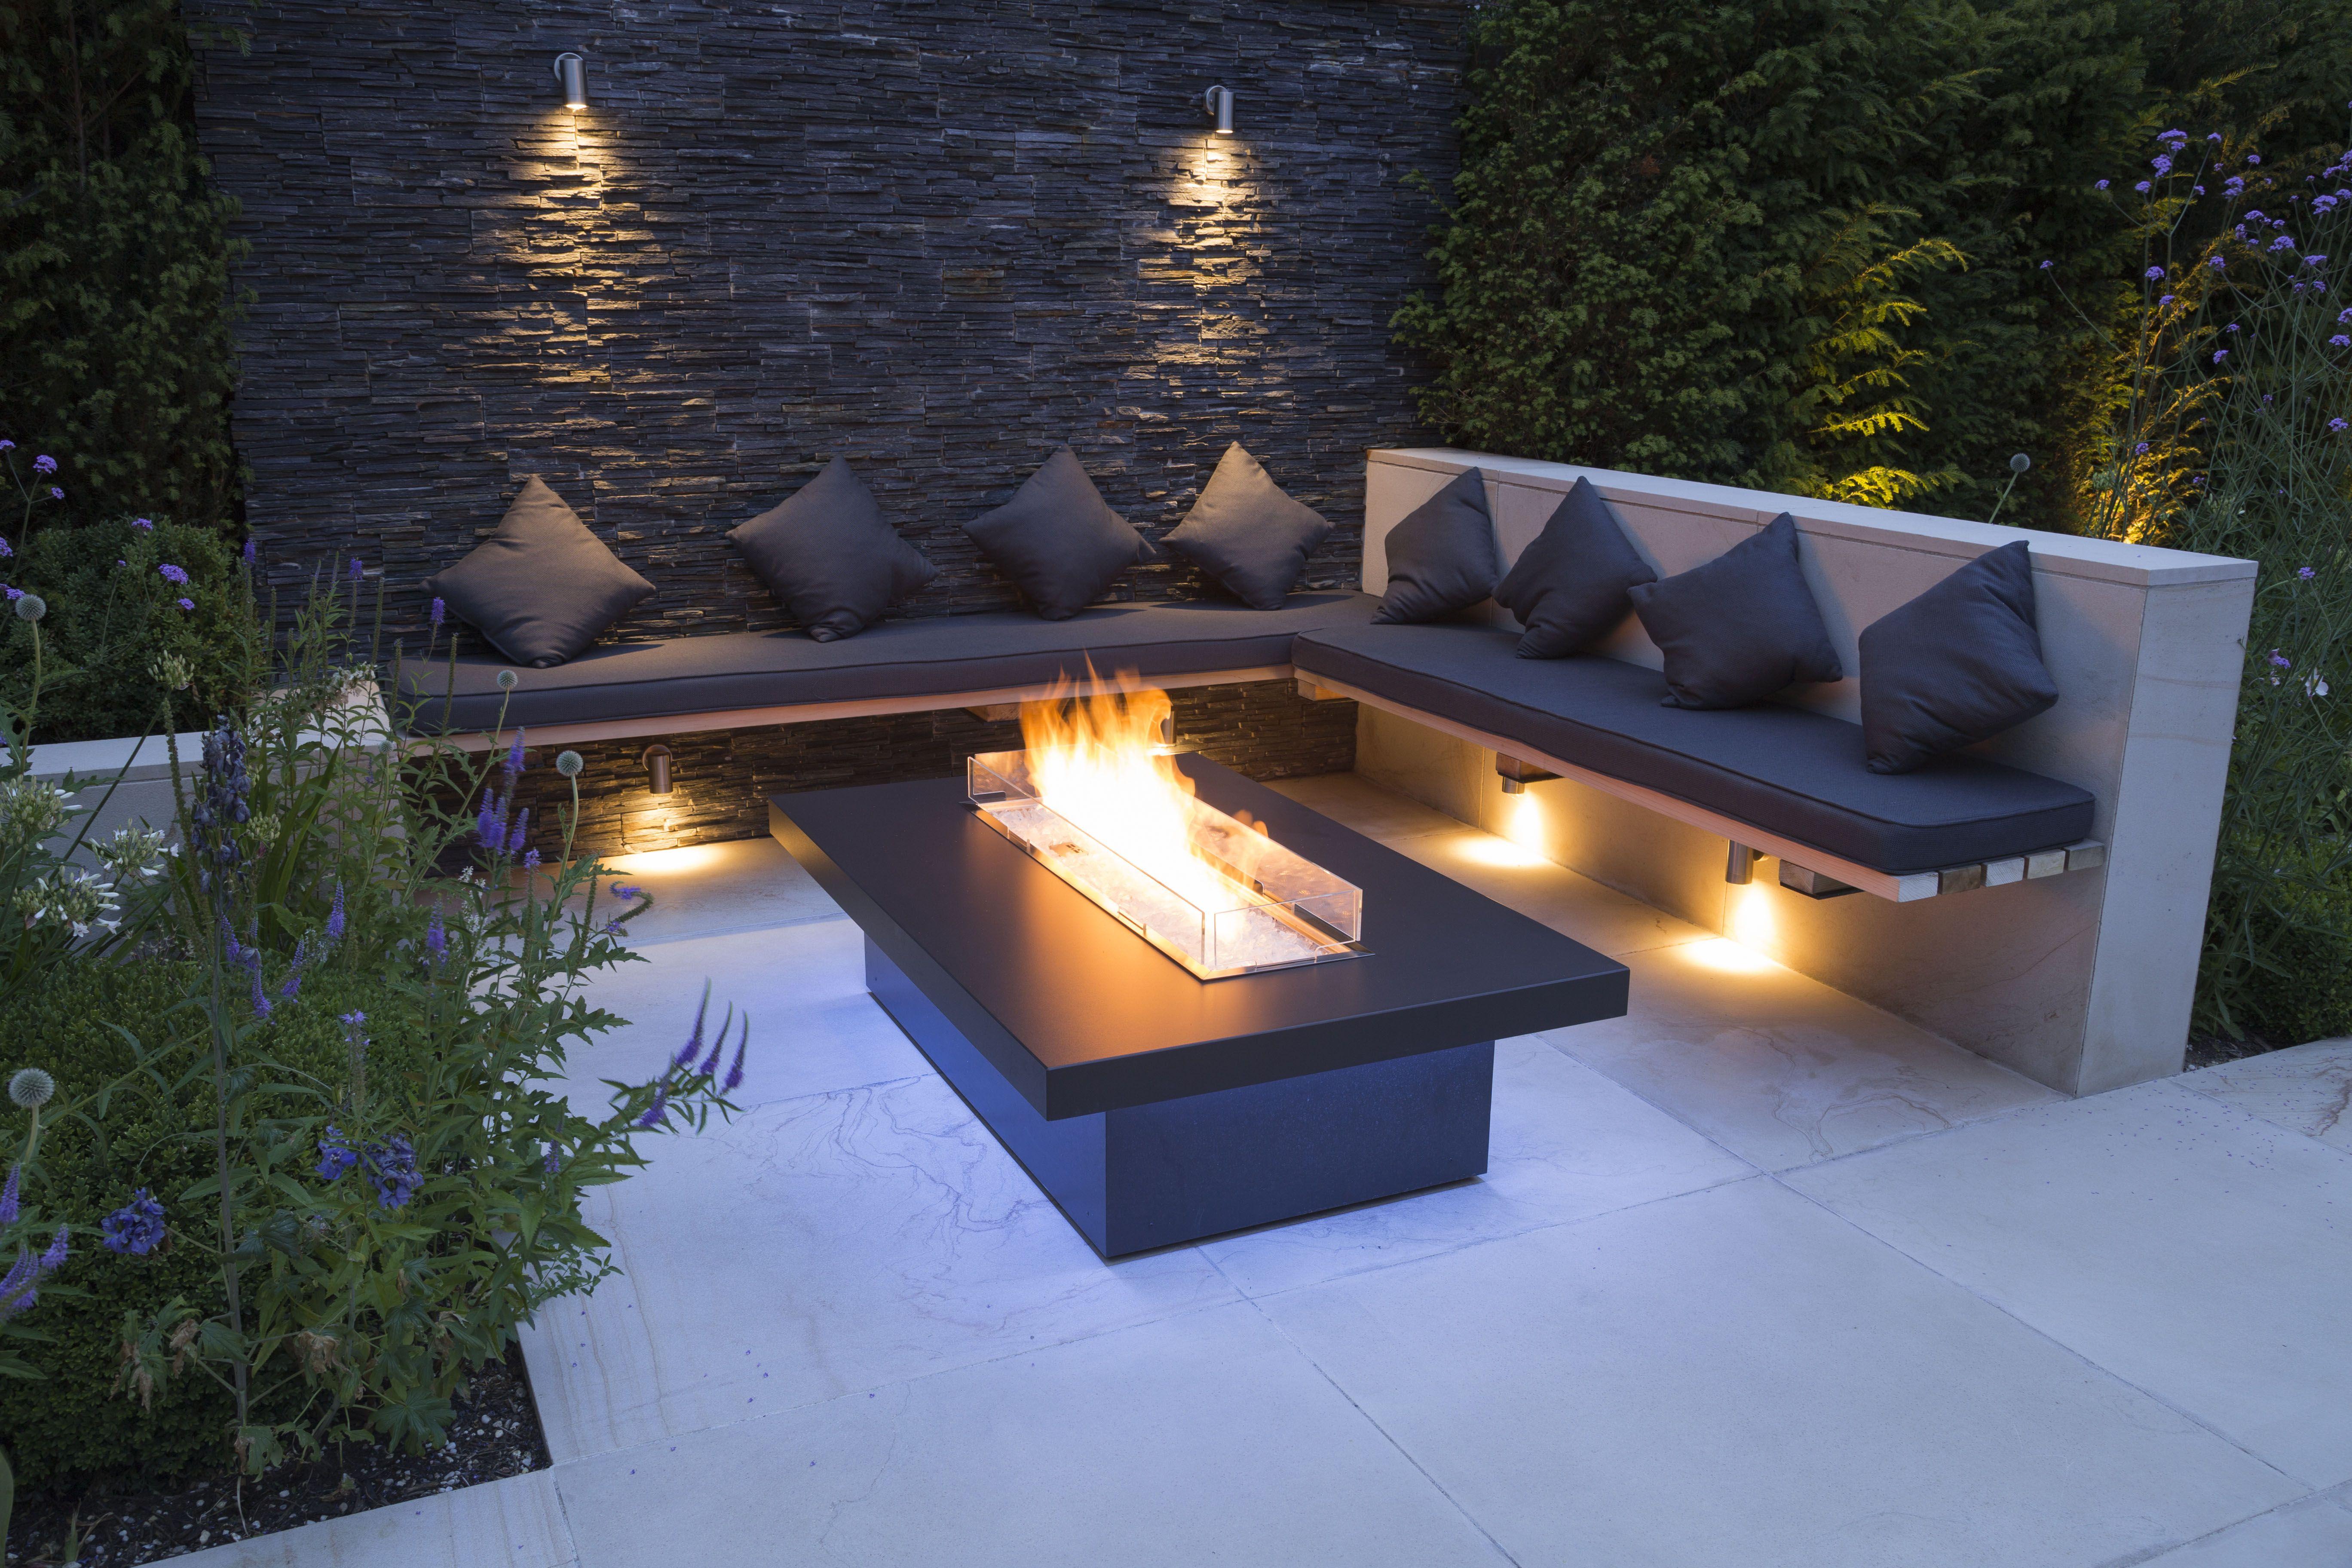 Outdoor Living Bespoke Seating Rivelin Firetable Outdoor Lighting Slate Feature Wall Contemporary Planting Backyard Patio Patio Design Backyard Seating